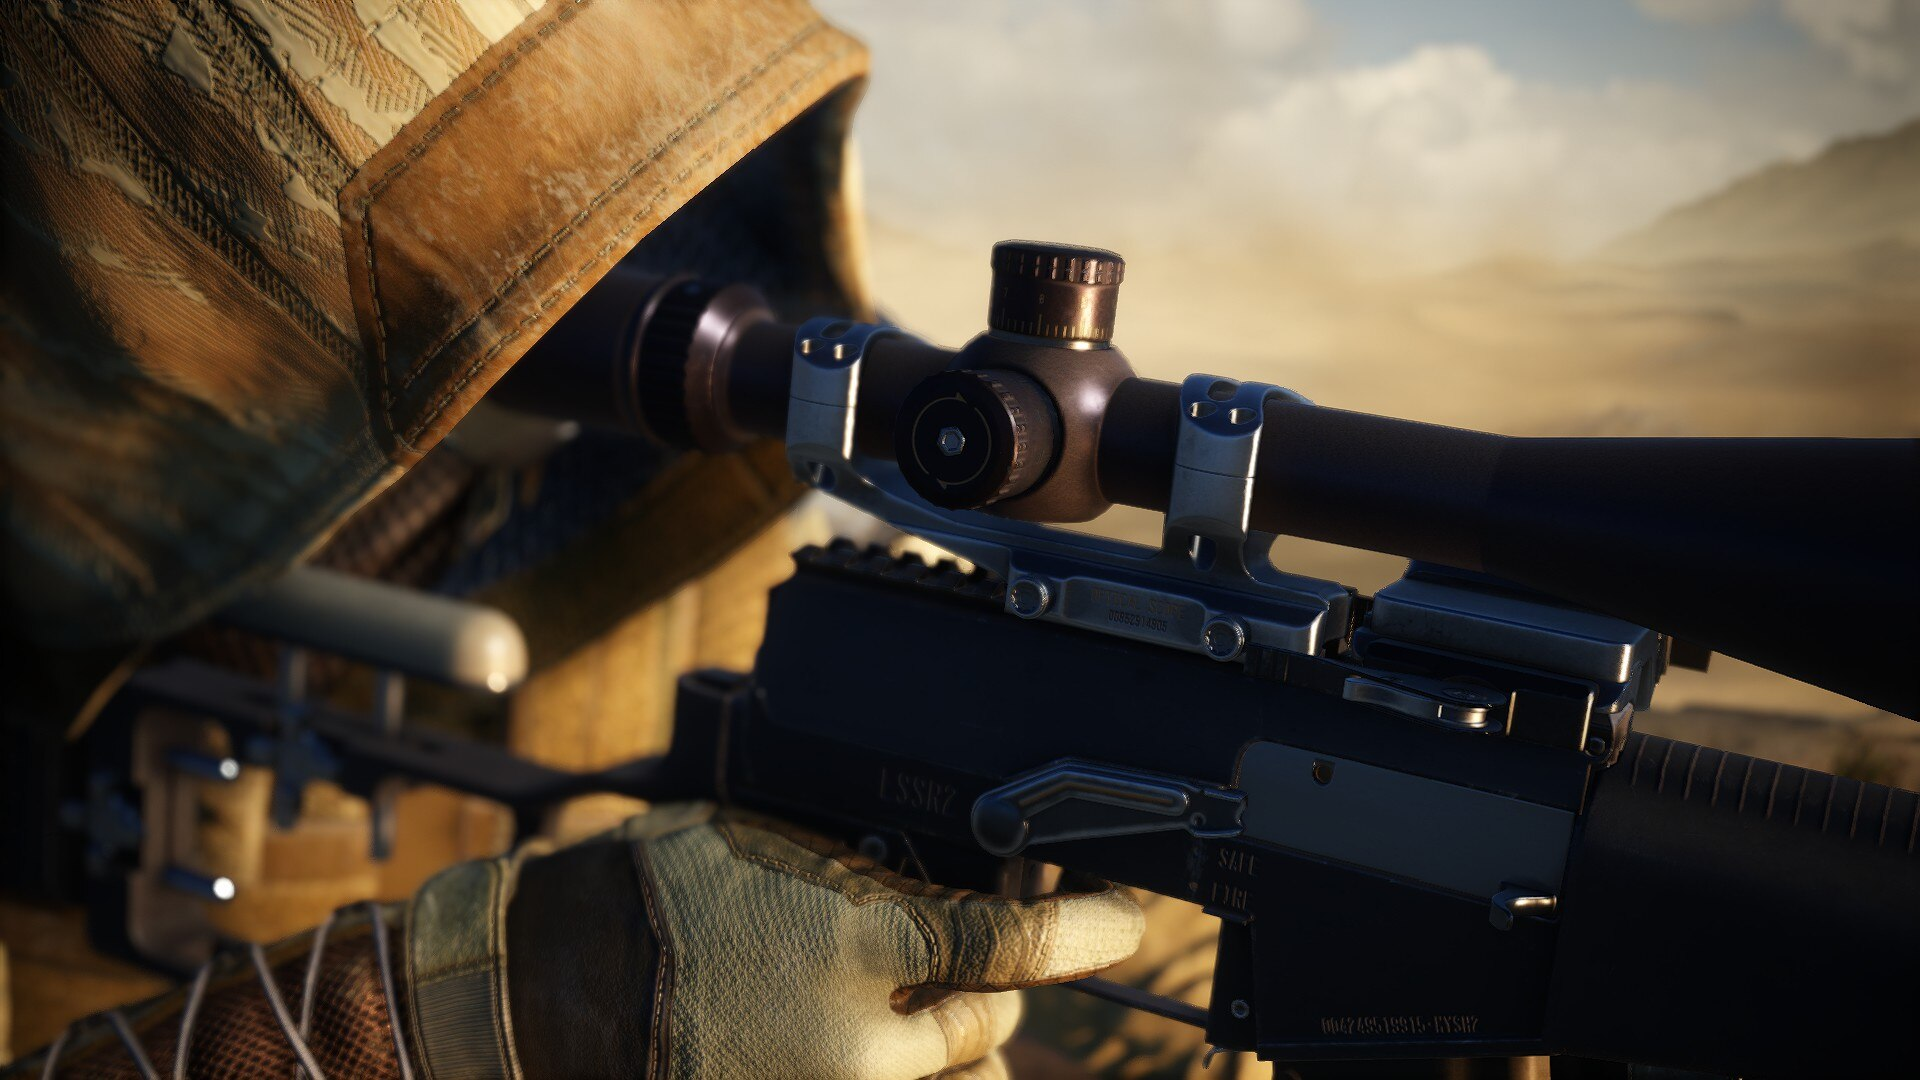 PS5-версия Sniper: Ghost Warrior Contracts 2 появится 24 августа